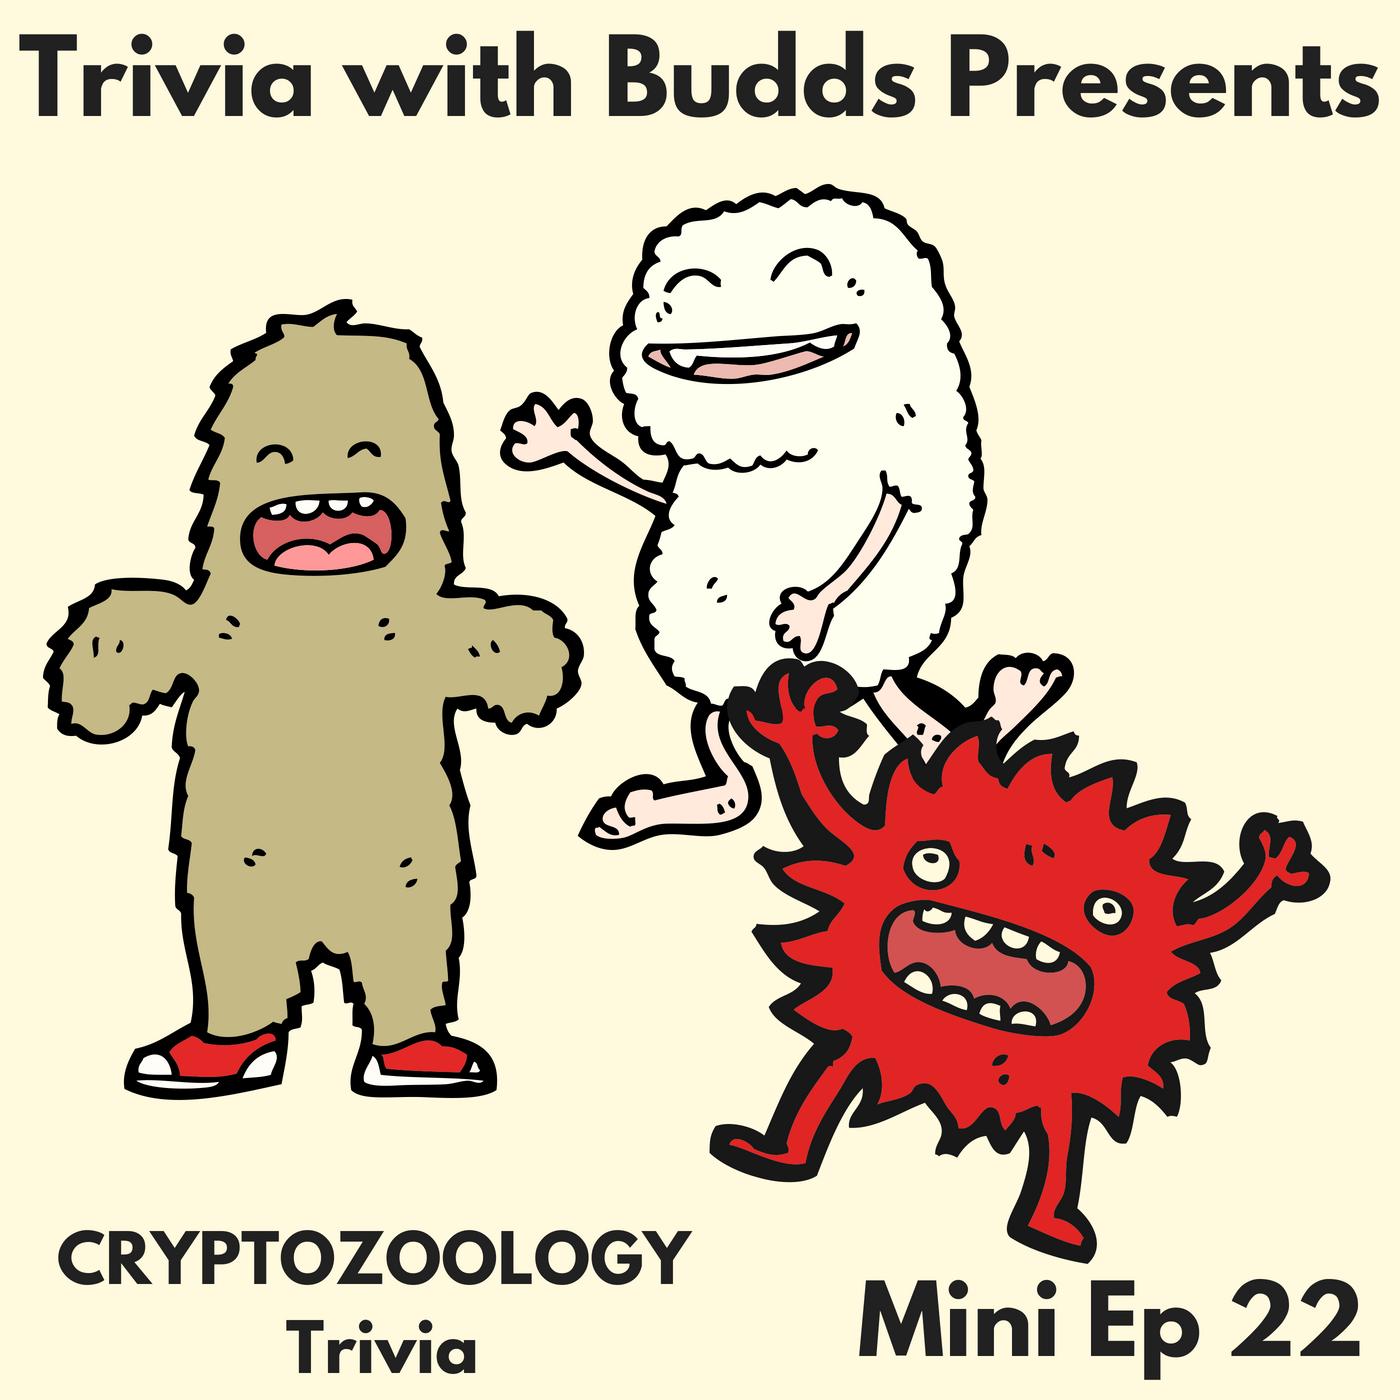 Artwork for Mini Ep 22. Cryptozoology Trivia